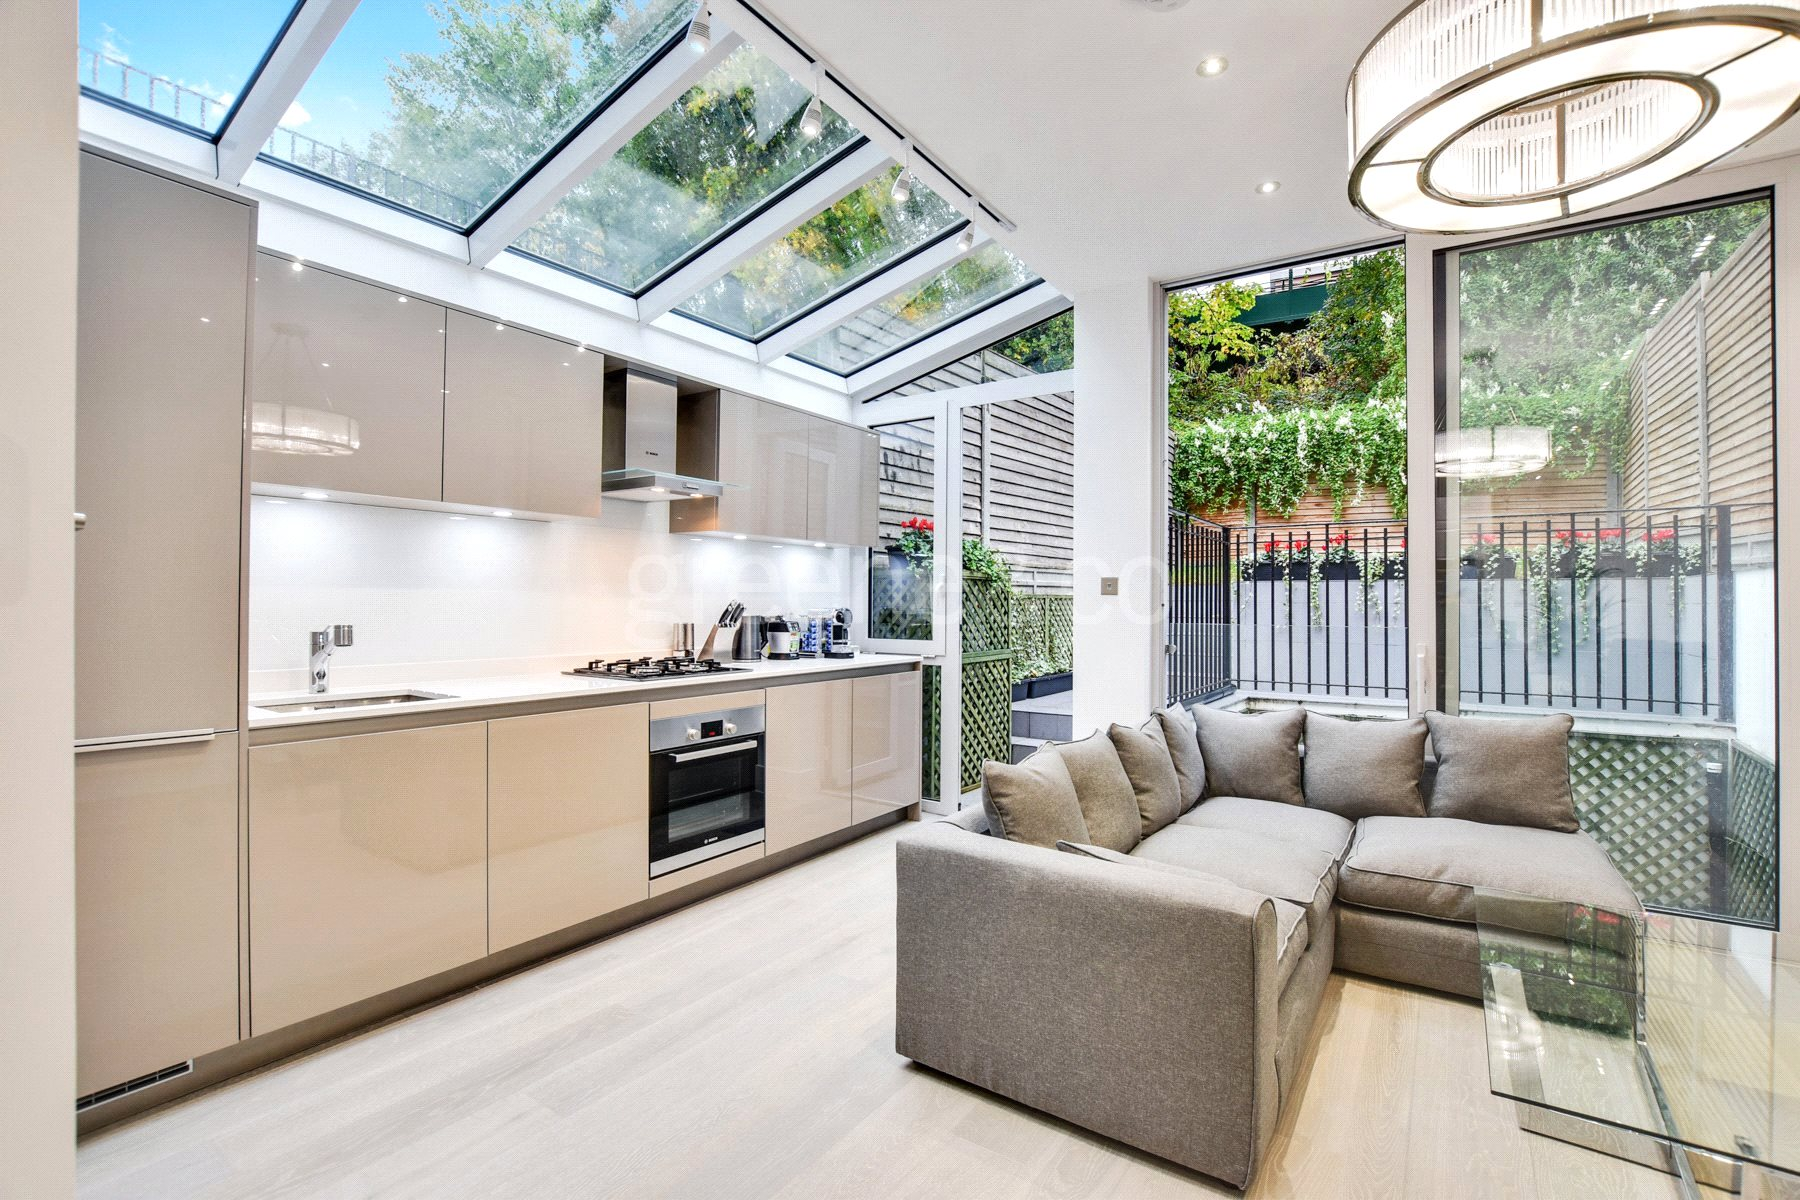 2 Bedrooms Maisonette Flat for sale in Sherriff Road, West Hampstead, London, NW6